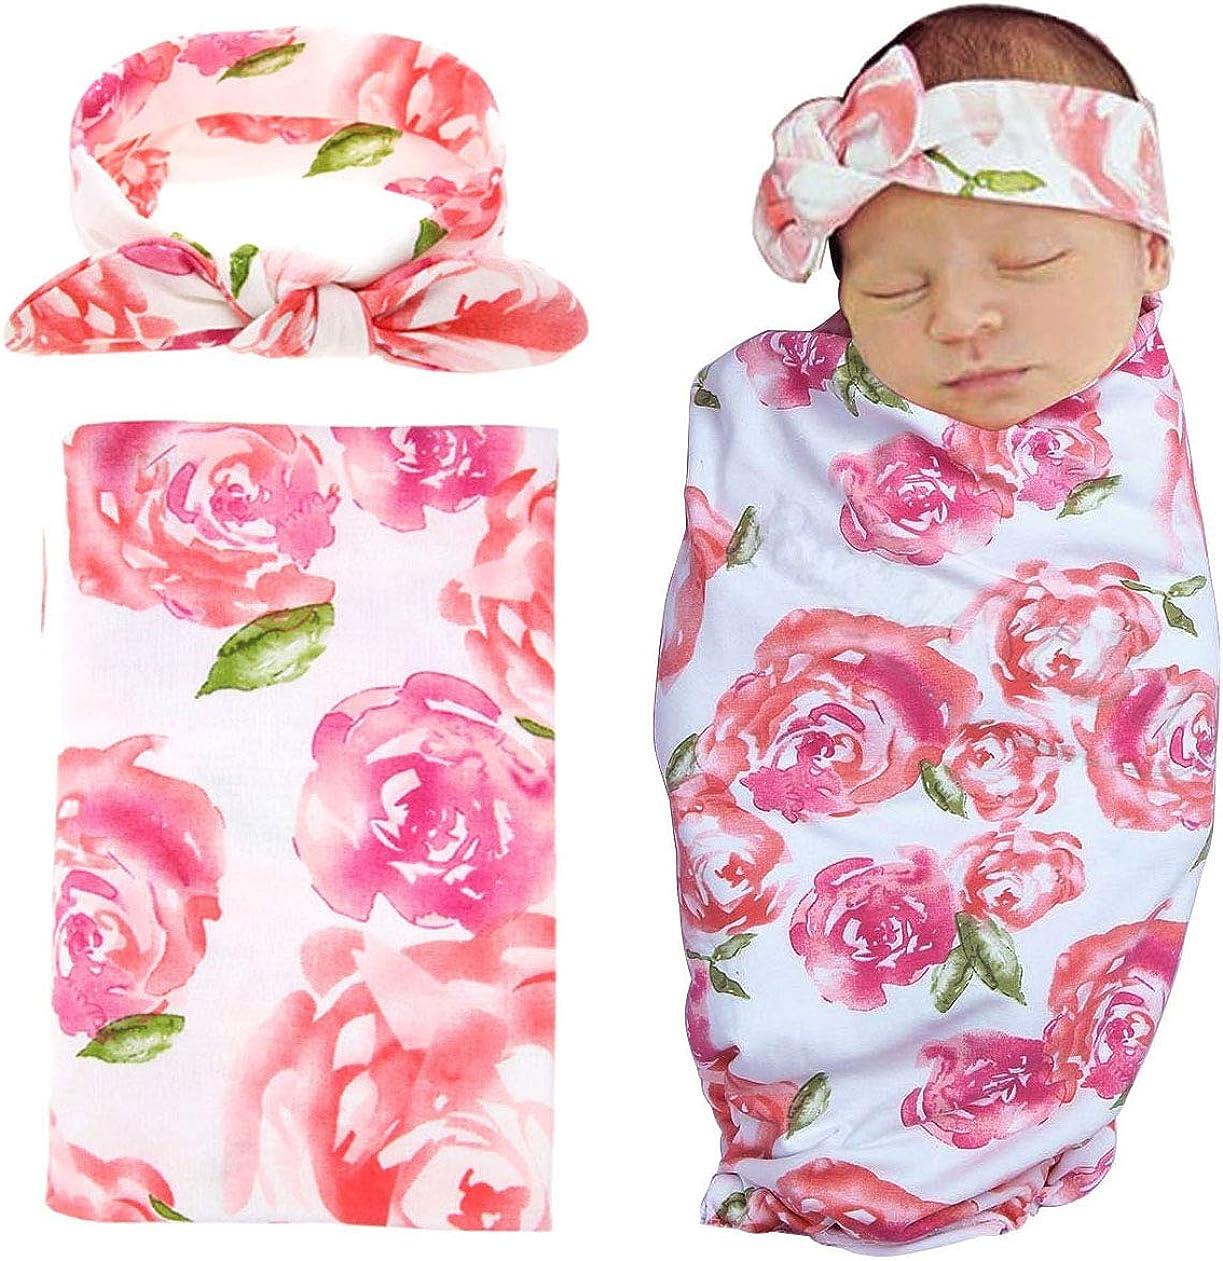 Infant Sage Swaddle with Headband Newborn Baby Swaddle Sack Newborn Photography Prop Pink Floral Baby Swaddle Wrap Cocoon Swaddle Sleeping Bag